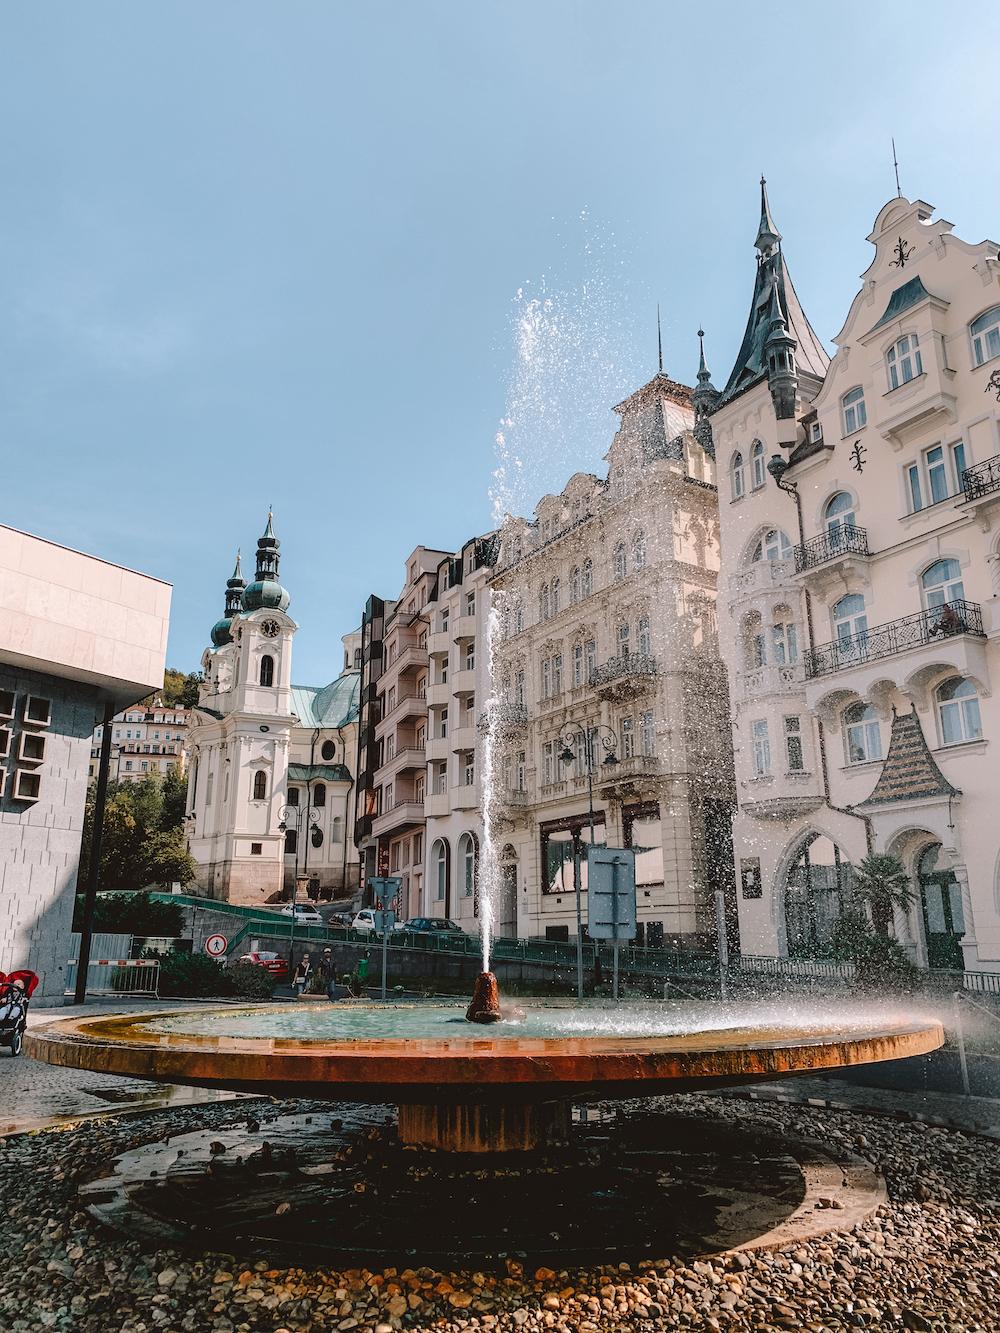 Kleinere hotspring in Karlovy Vary